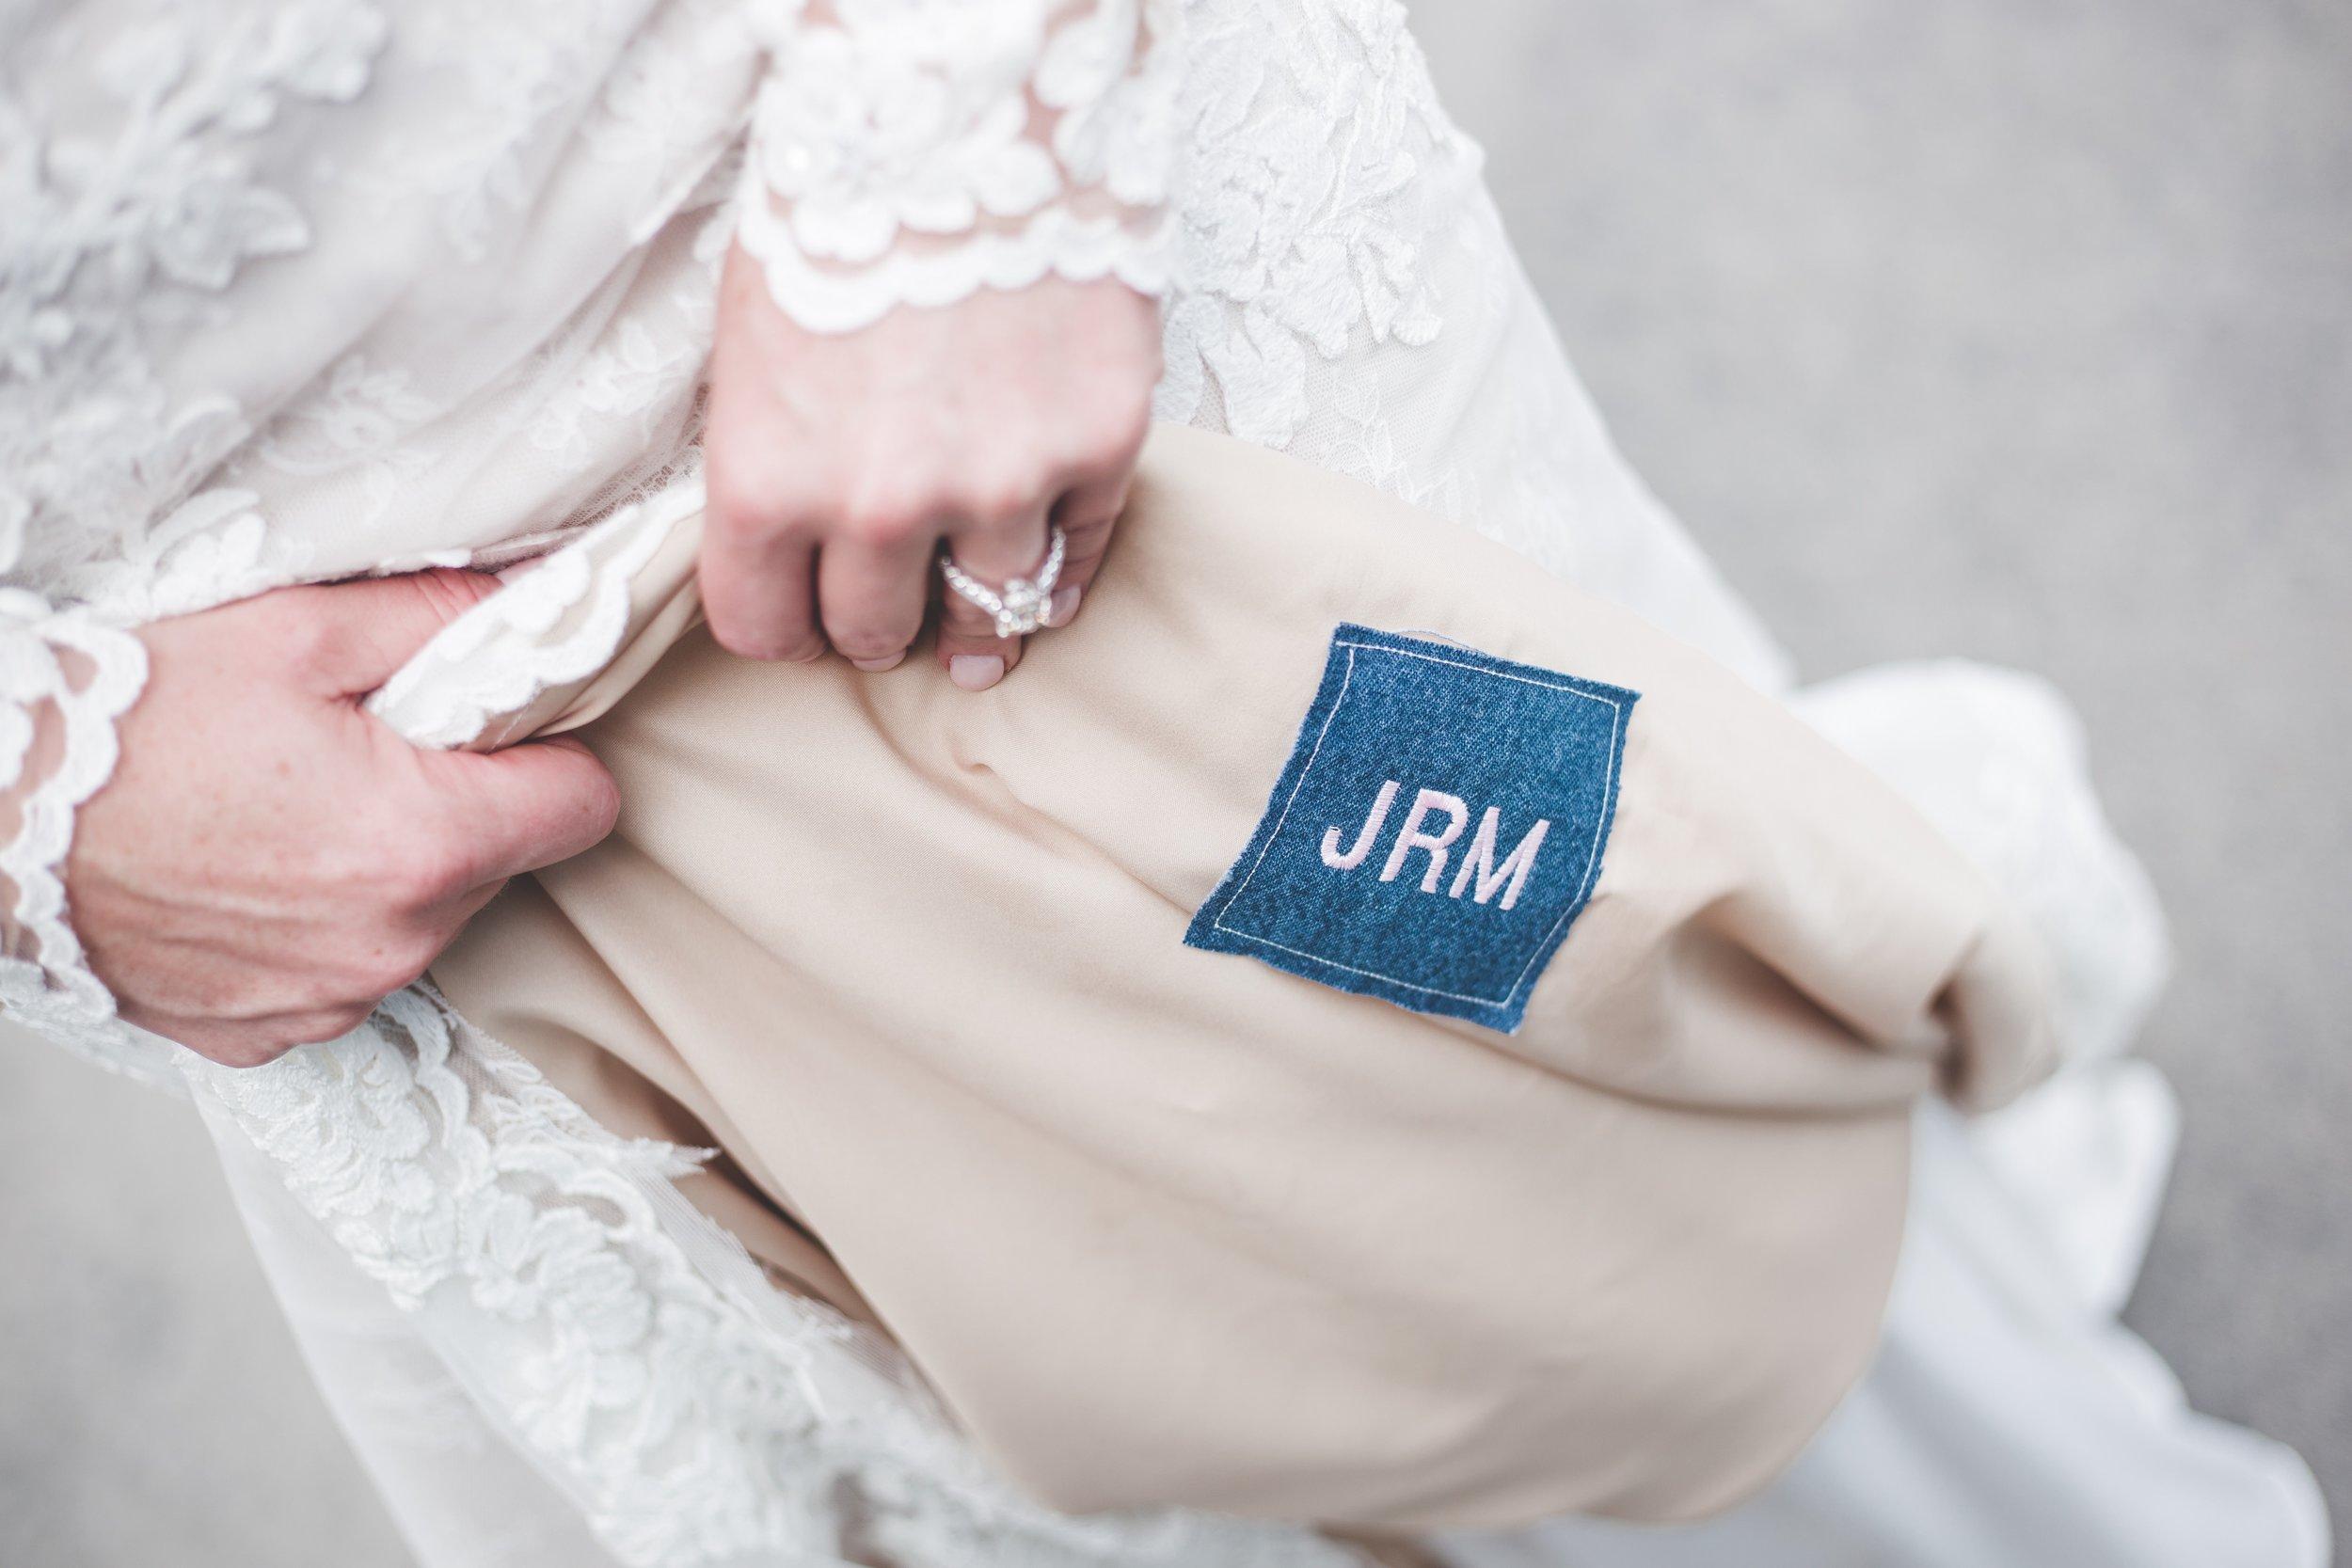 cider-gallery-lawrence-ks-wedding-photographer-jason-domingues-photography-lindsey-paul-0238.jpg